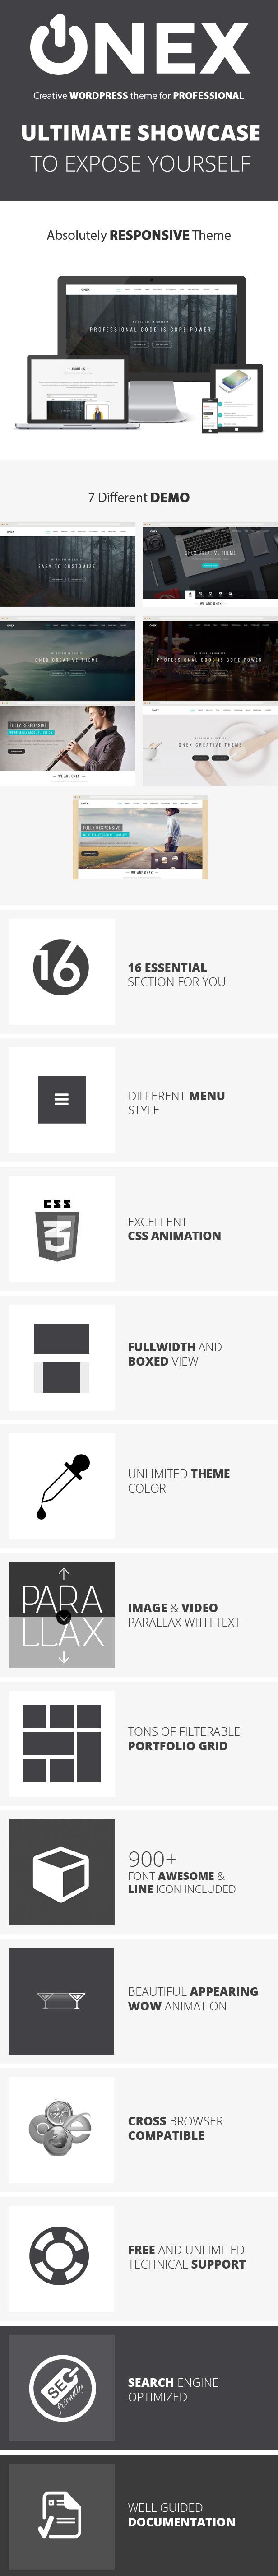 Onex Feature Description by ThemeBucket